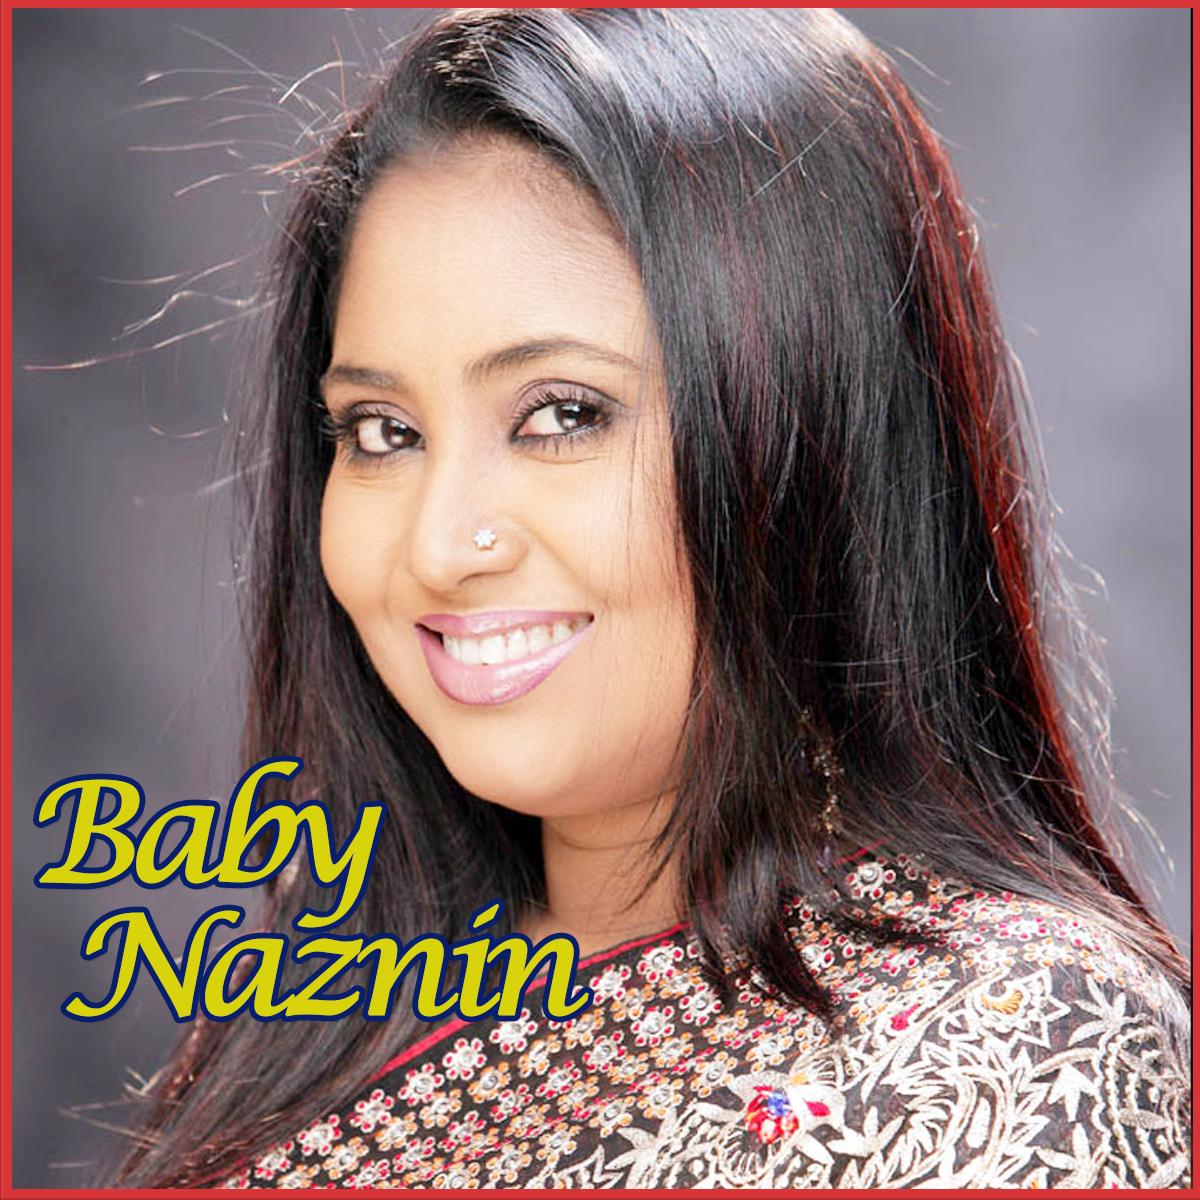 Bikaler ses alo singer by kumart sanu & kobita Bangla Karaoke With Lyrics